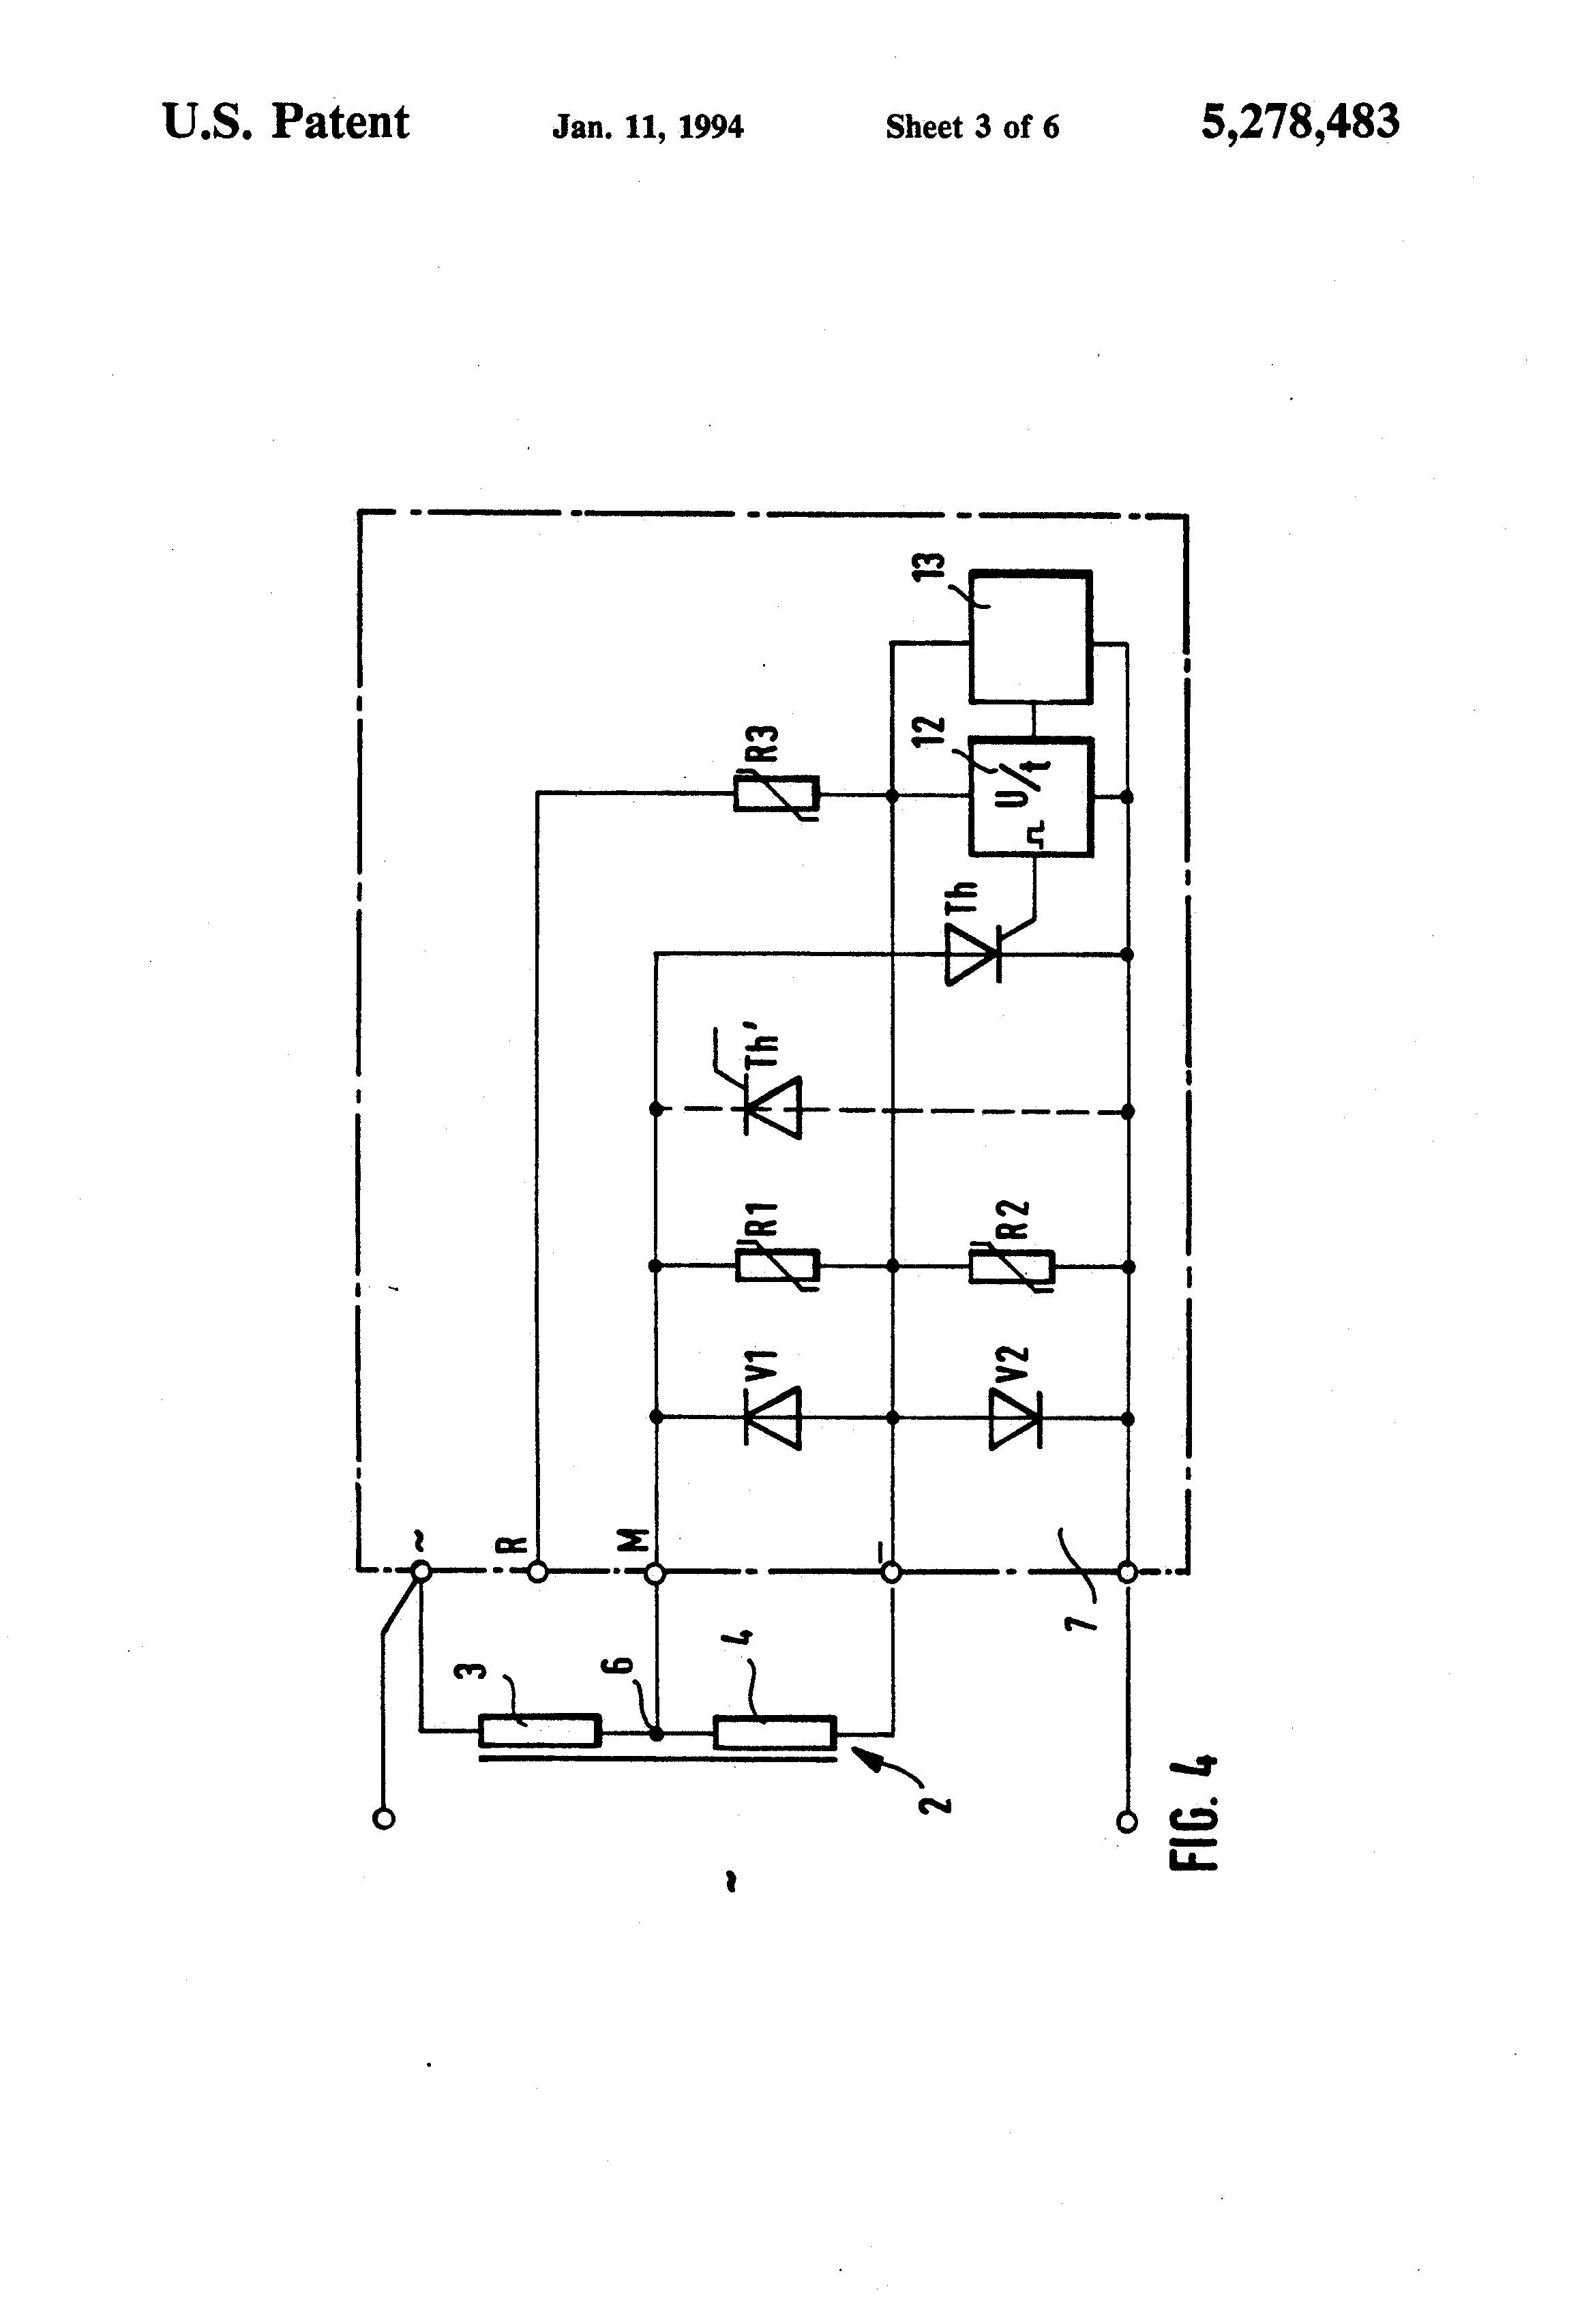 sew eurodrive motor wiring diagram inspirational half way rectifier wiring diagram ponents of sew eurodrive motor wiring diagram?resize=820%2C1205 sew eurodrive motor brake rectifier newmotorspot co